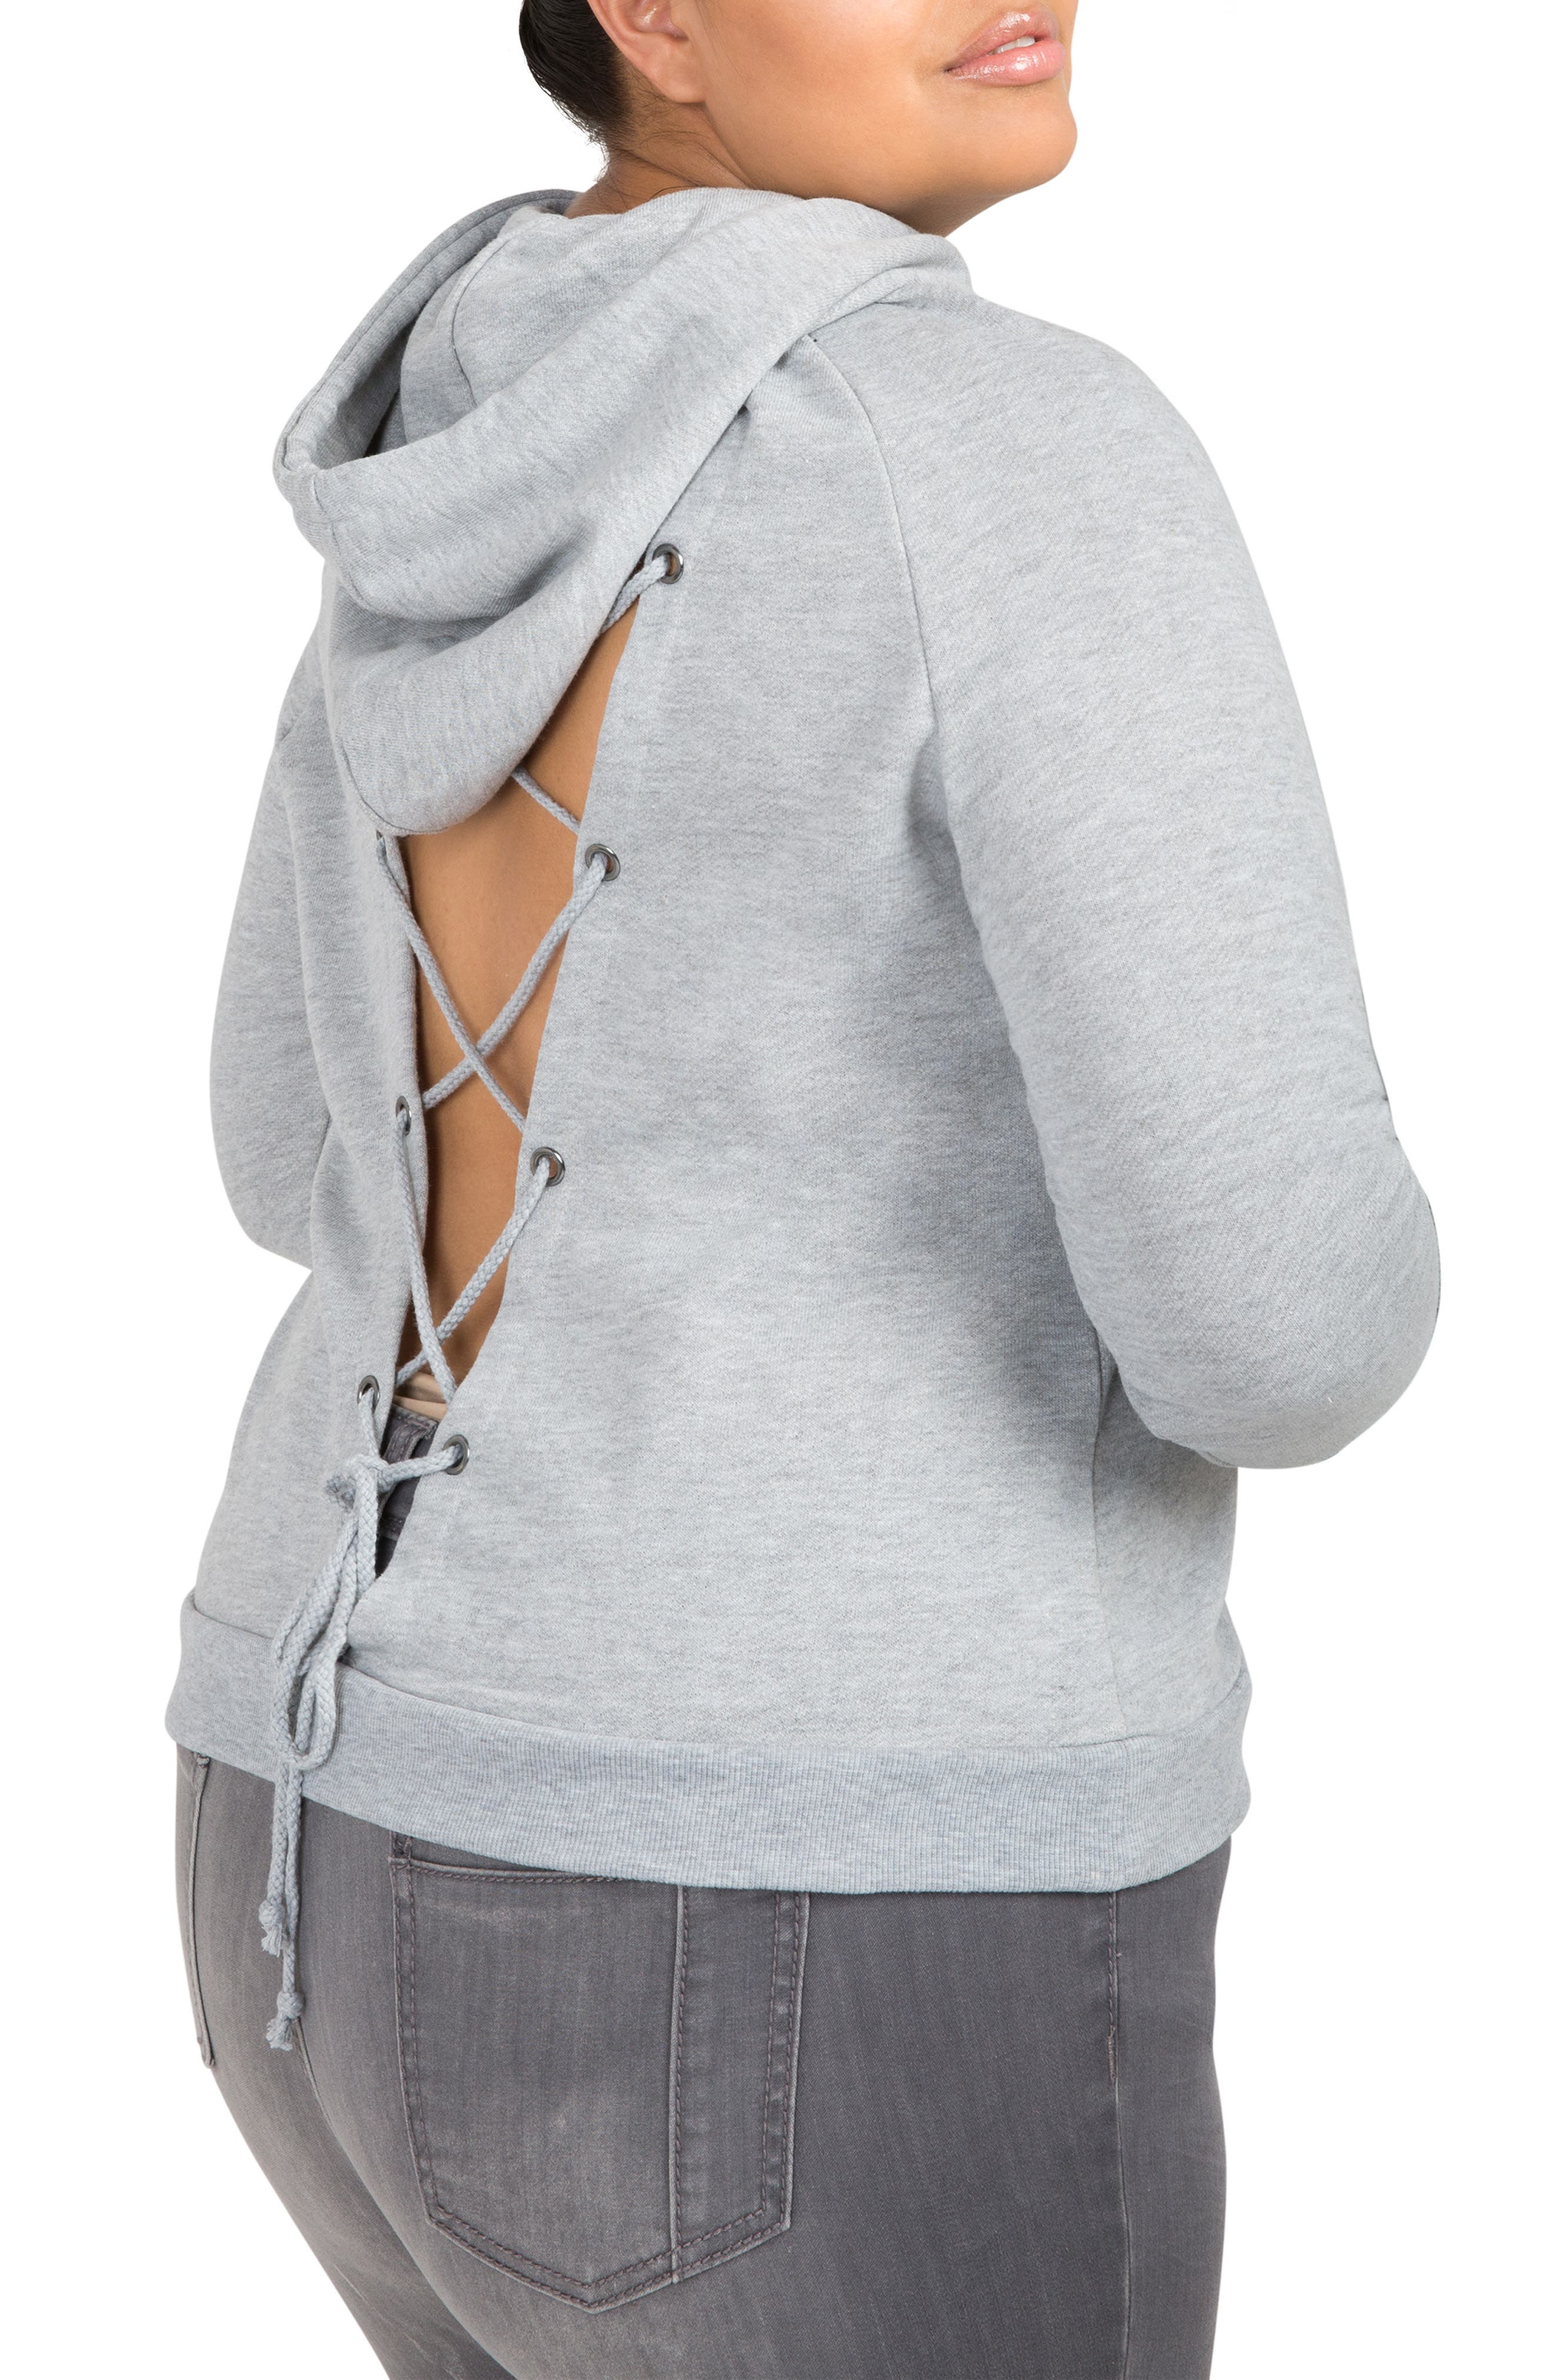 Back Cutout Hooded Sweatshirt,                             Alternate thumbnail 3, color,                             GREY